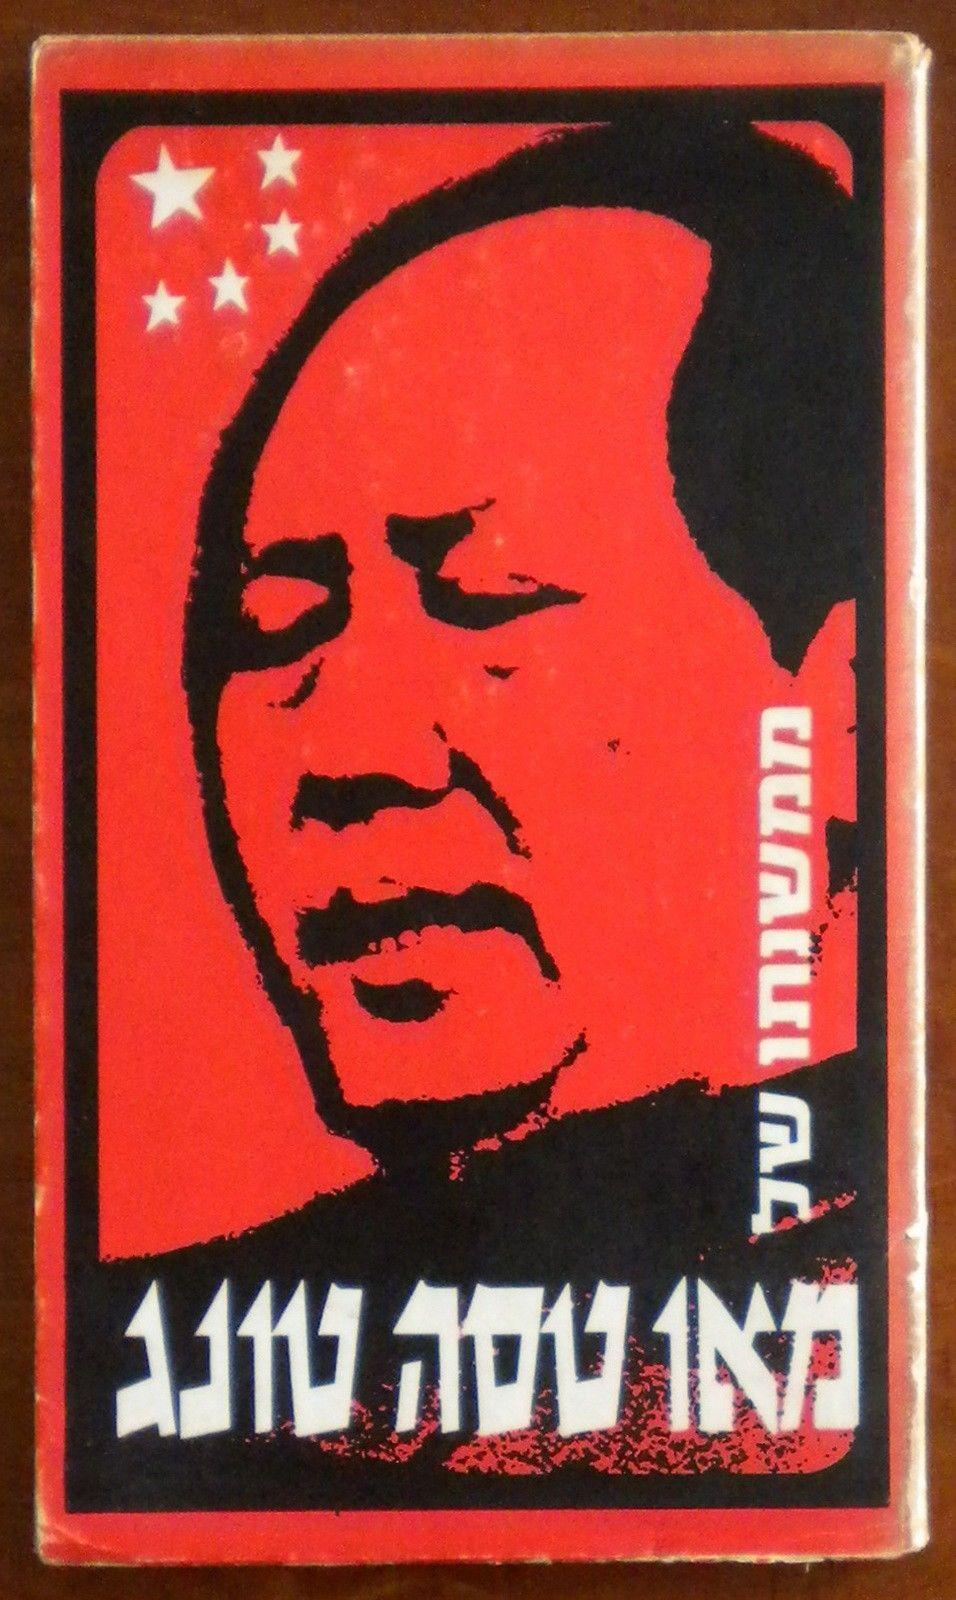 Quotations from Chairman Mao Tse Tung RARE Israel Hebrew